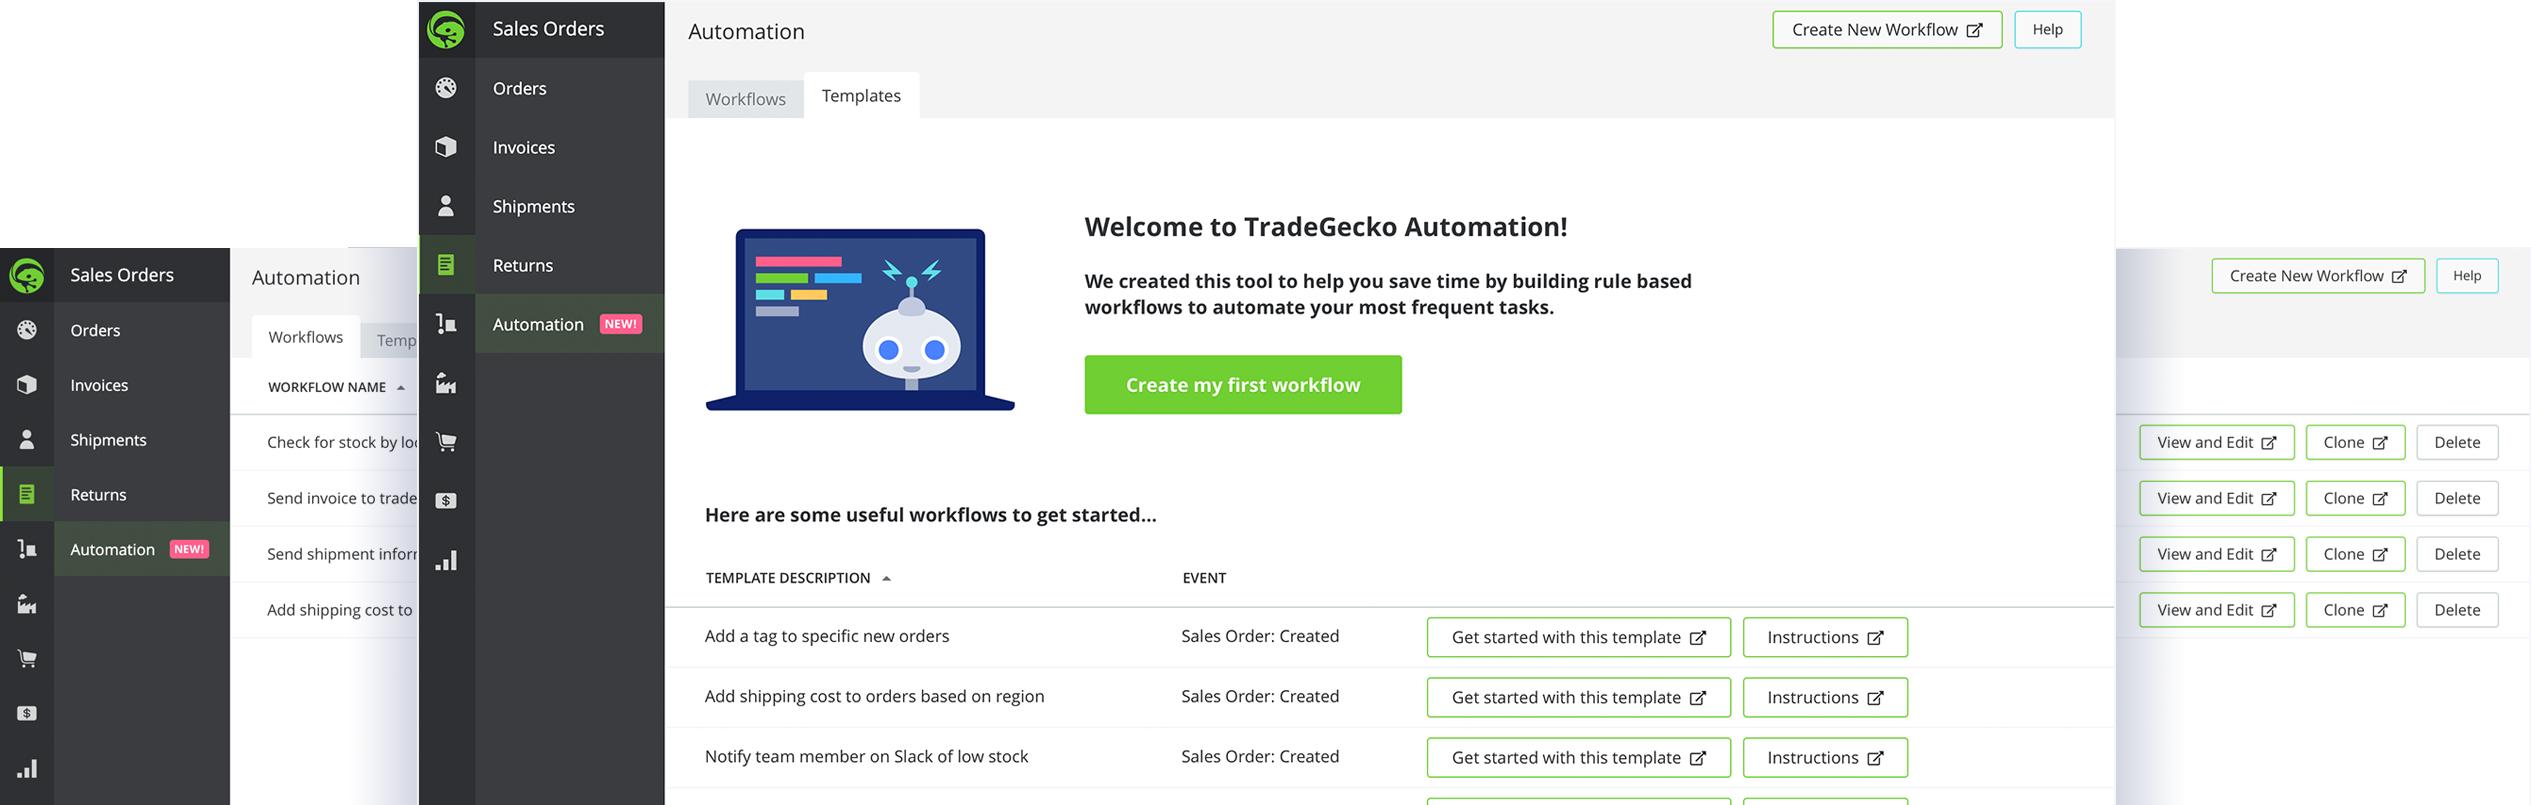 TradeGecko Automation